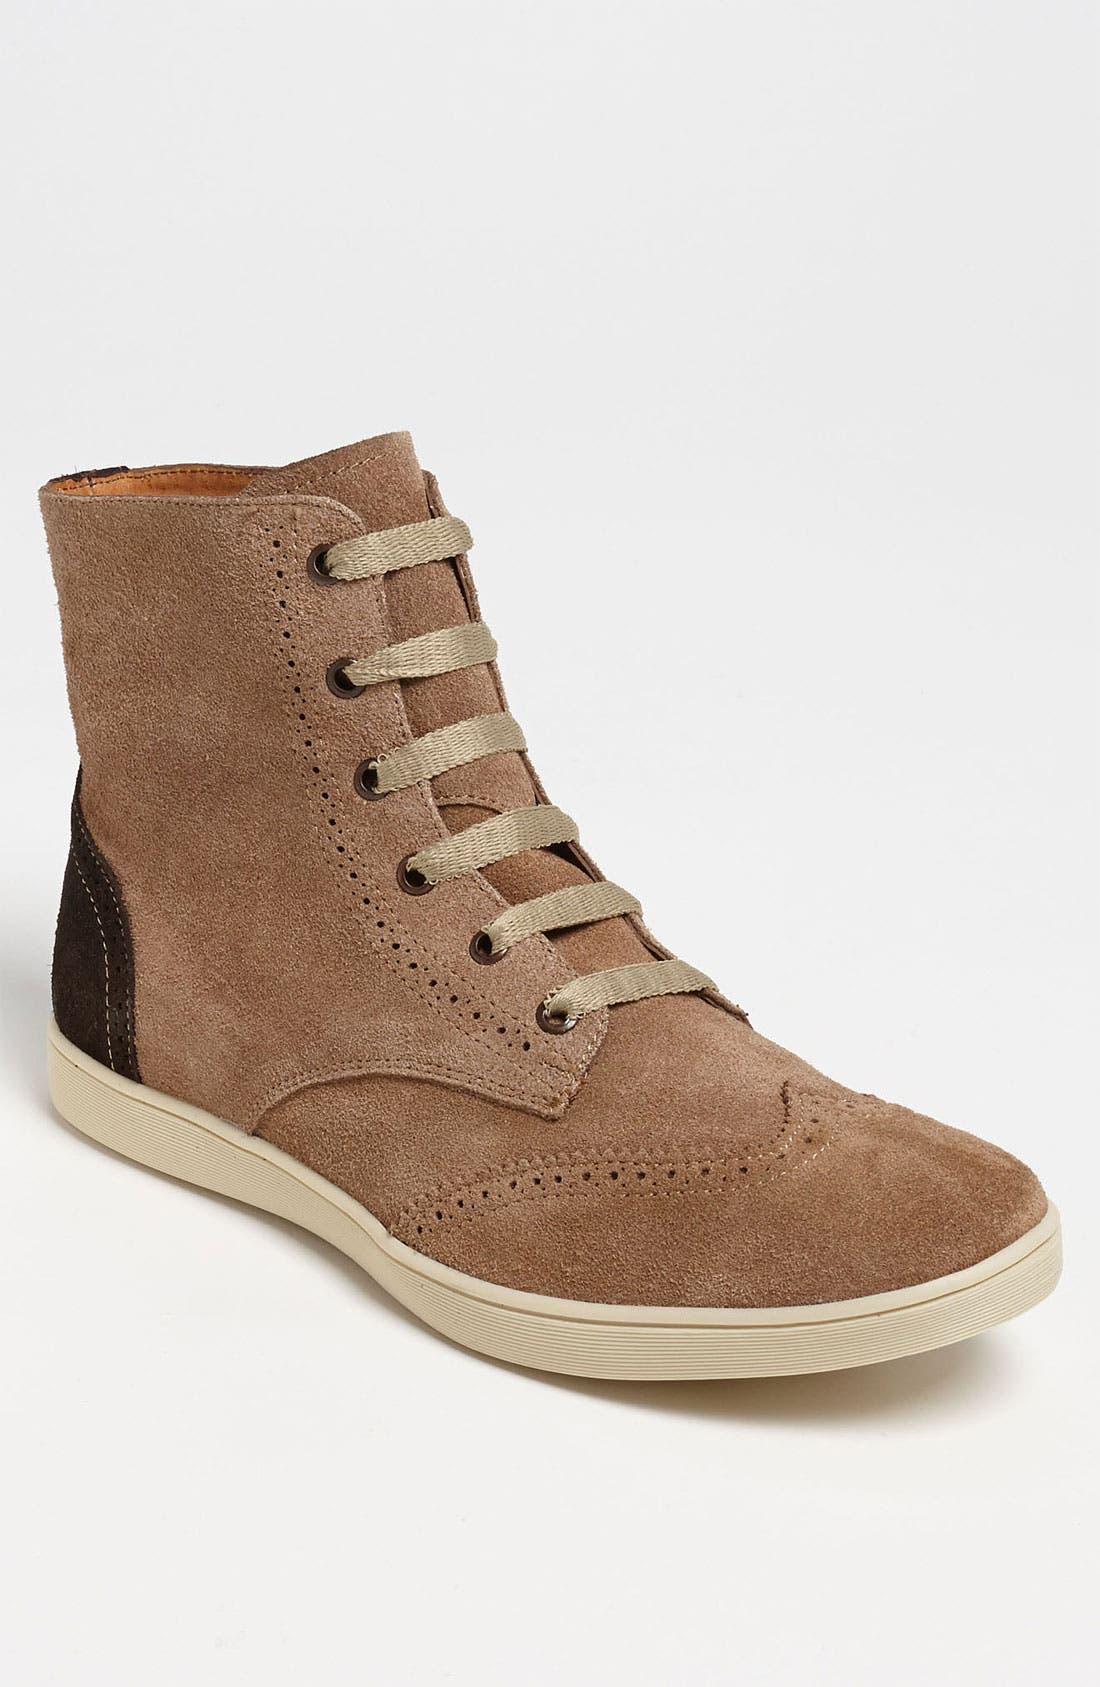 Alternate Image 1 Selected - J.D. Fisk 'Grant' Sneaker